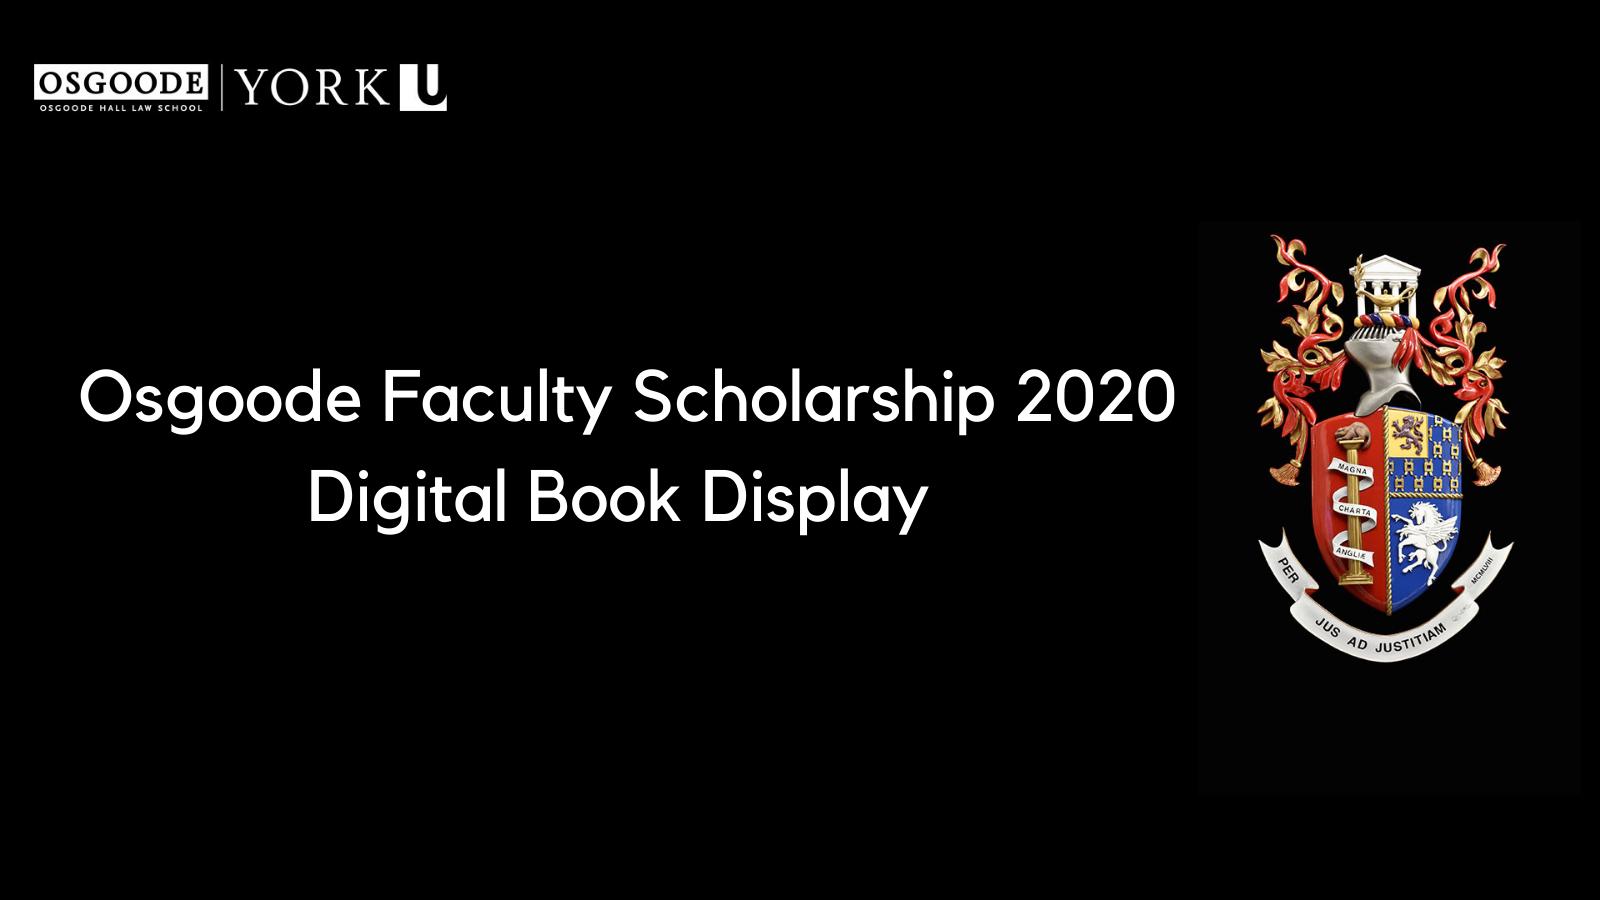 Osgoode Faculty Scholarship Digital Book Display Banner